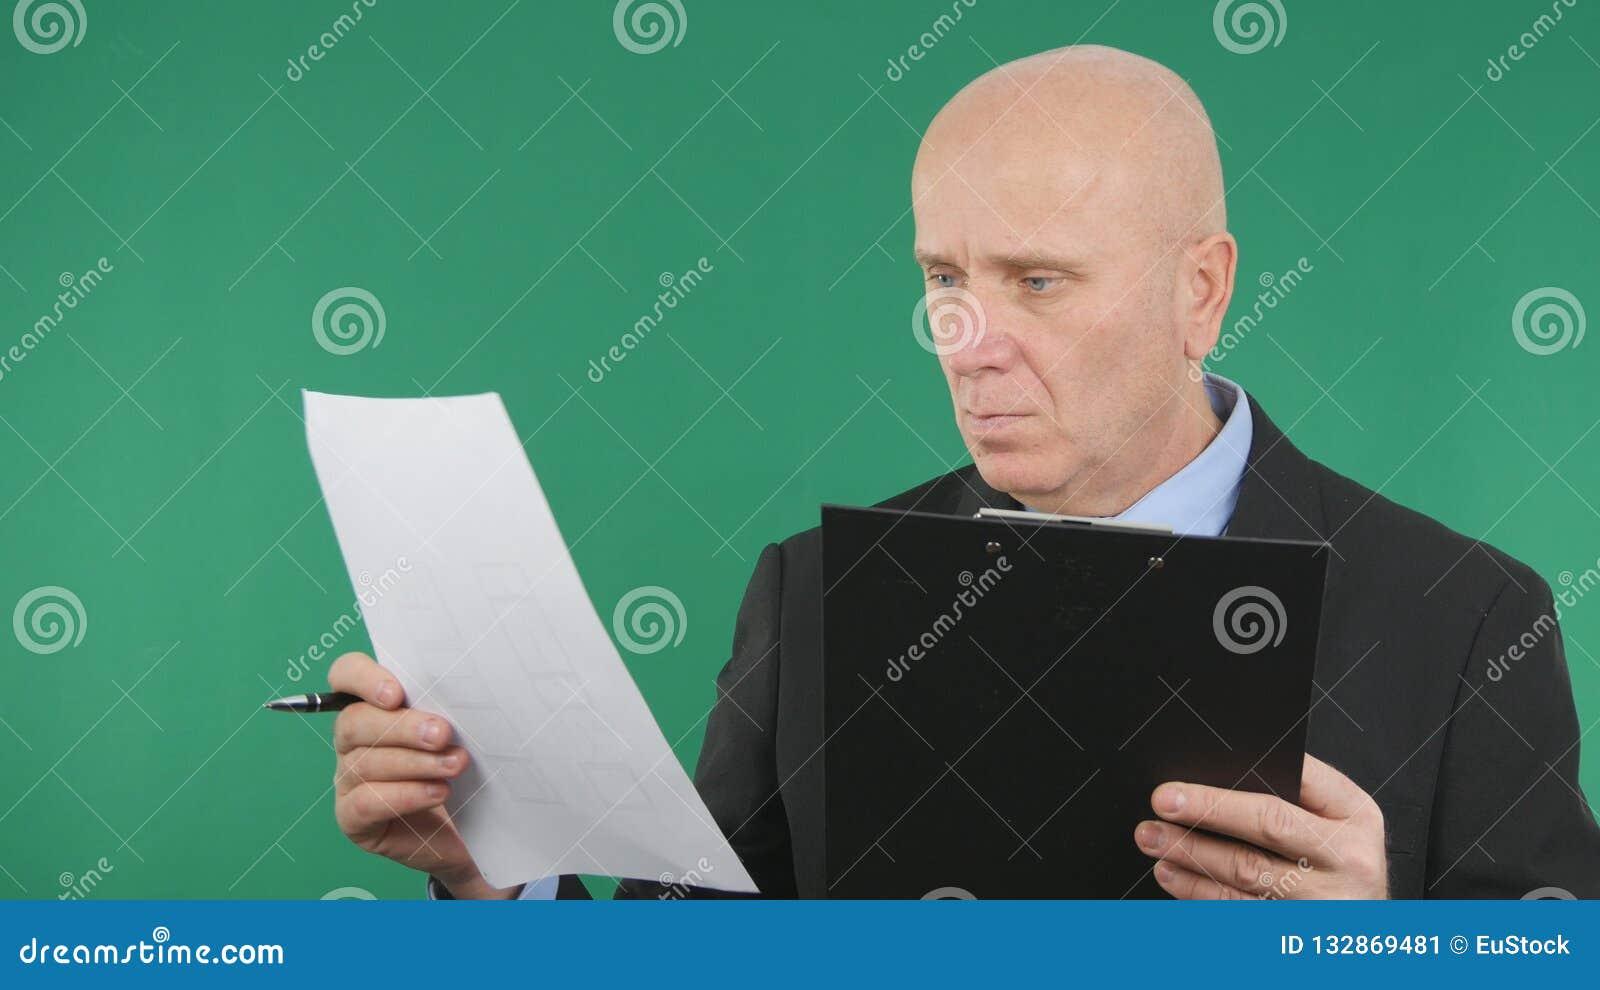 Zekere Zakenman Reading Business Contracts en Documenten